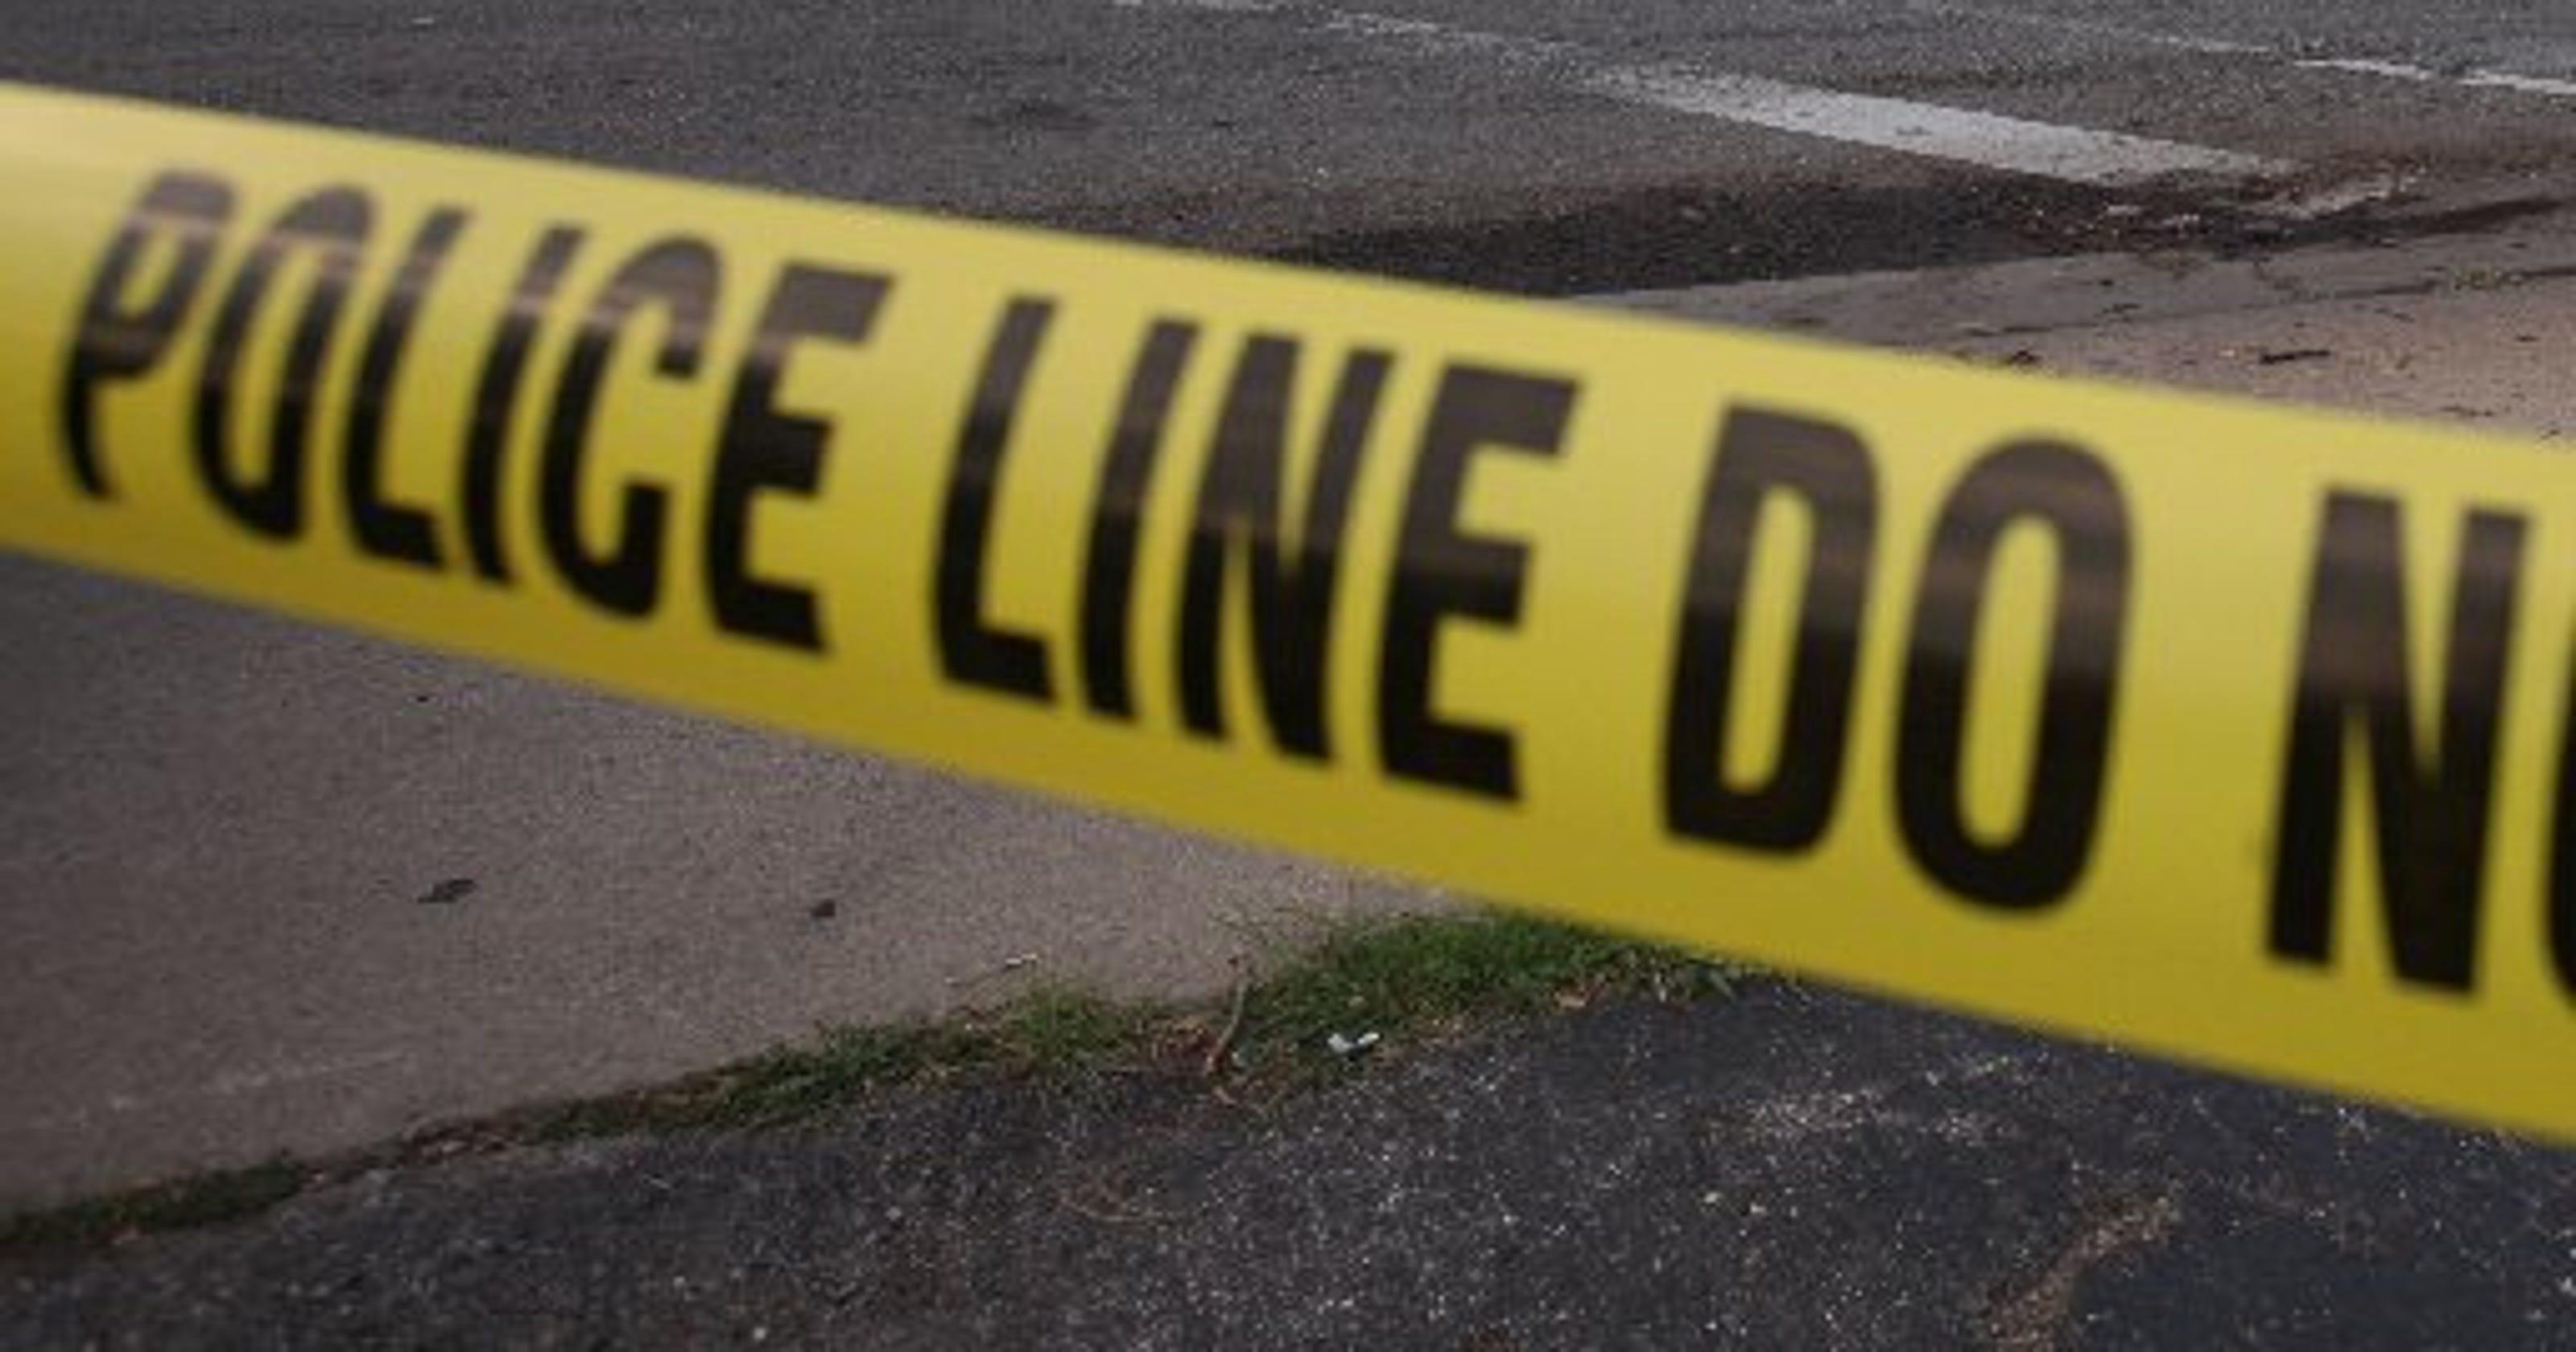 Two people killed in accident on I-94 near Oakwood in Allen Park